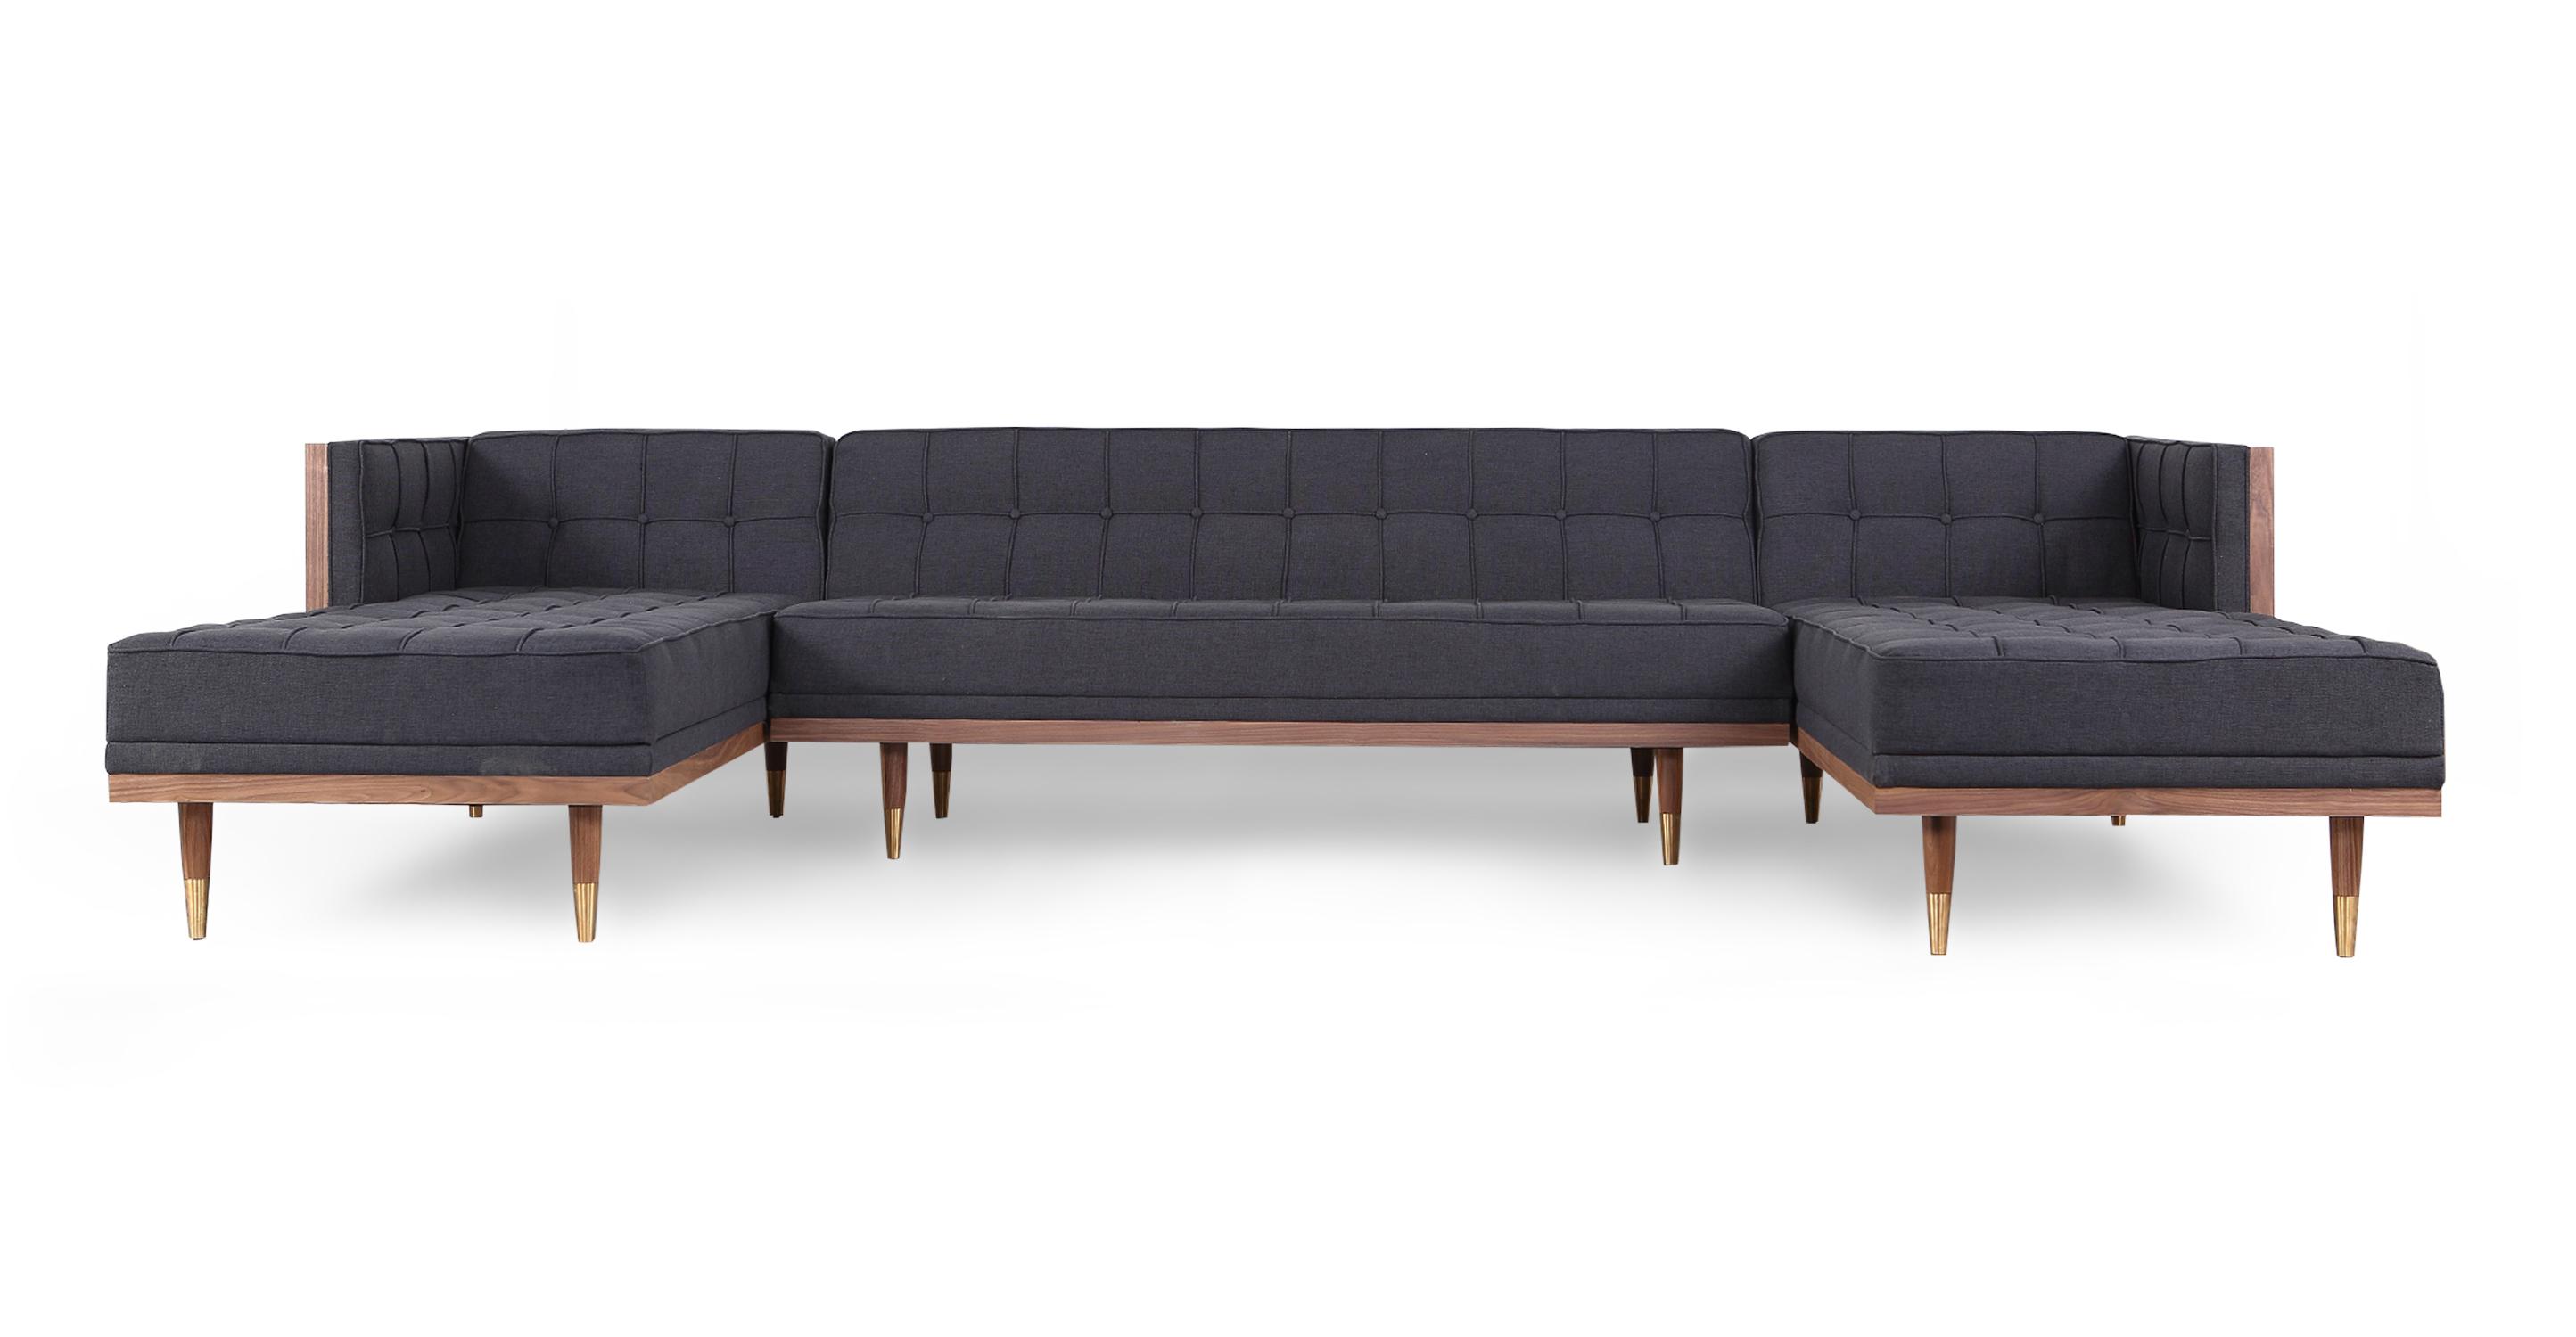 "Woodrow Box 126"" Sofa U-Sectional, Walnut/Urban Ink"